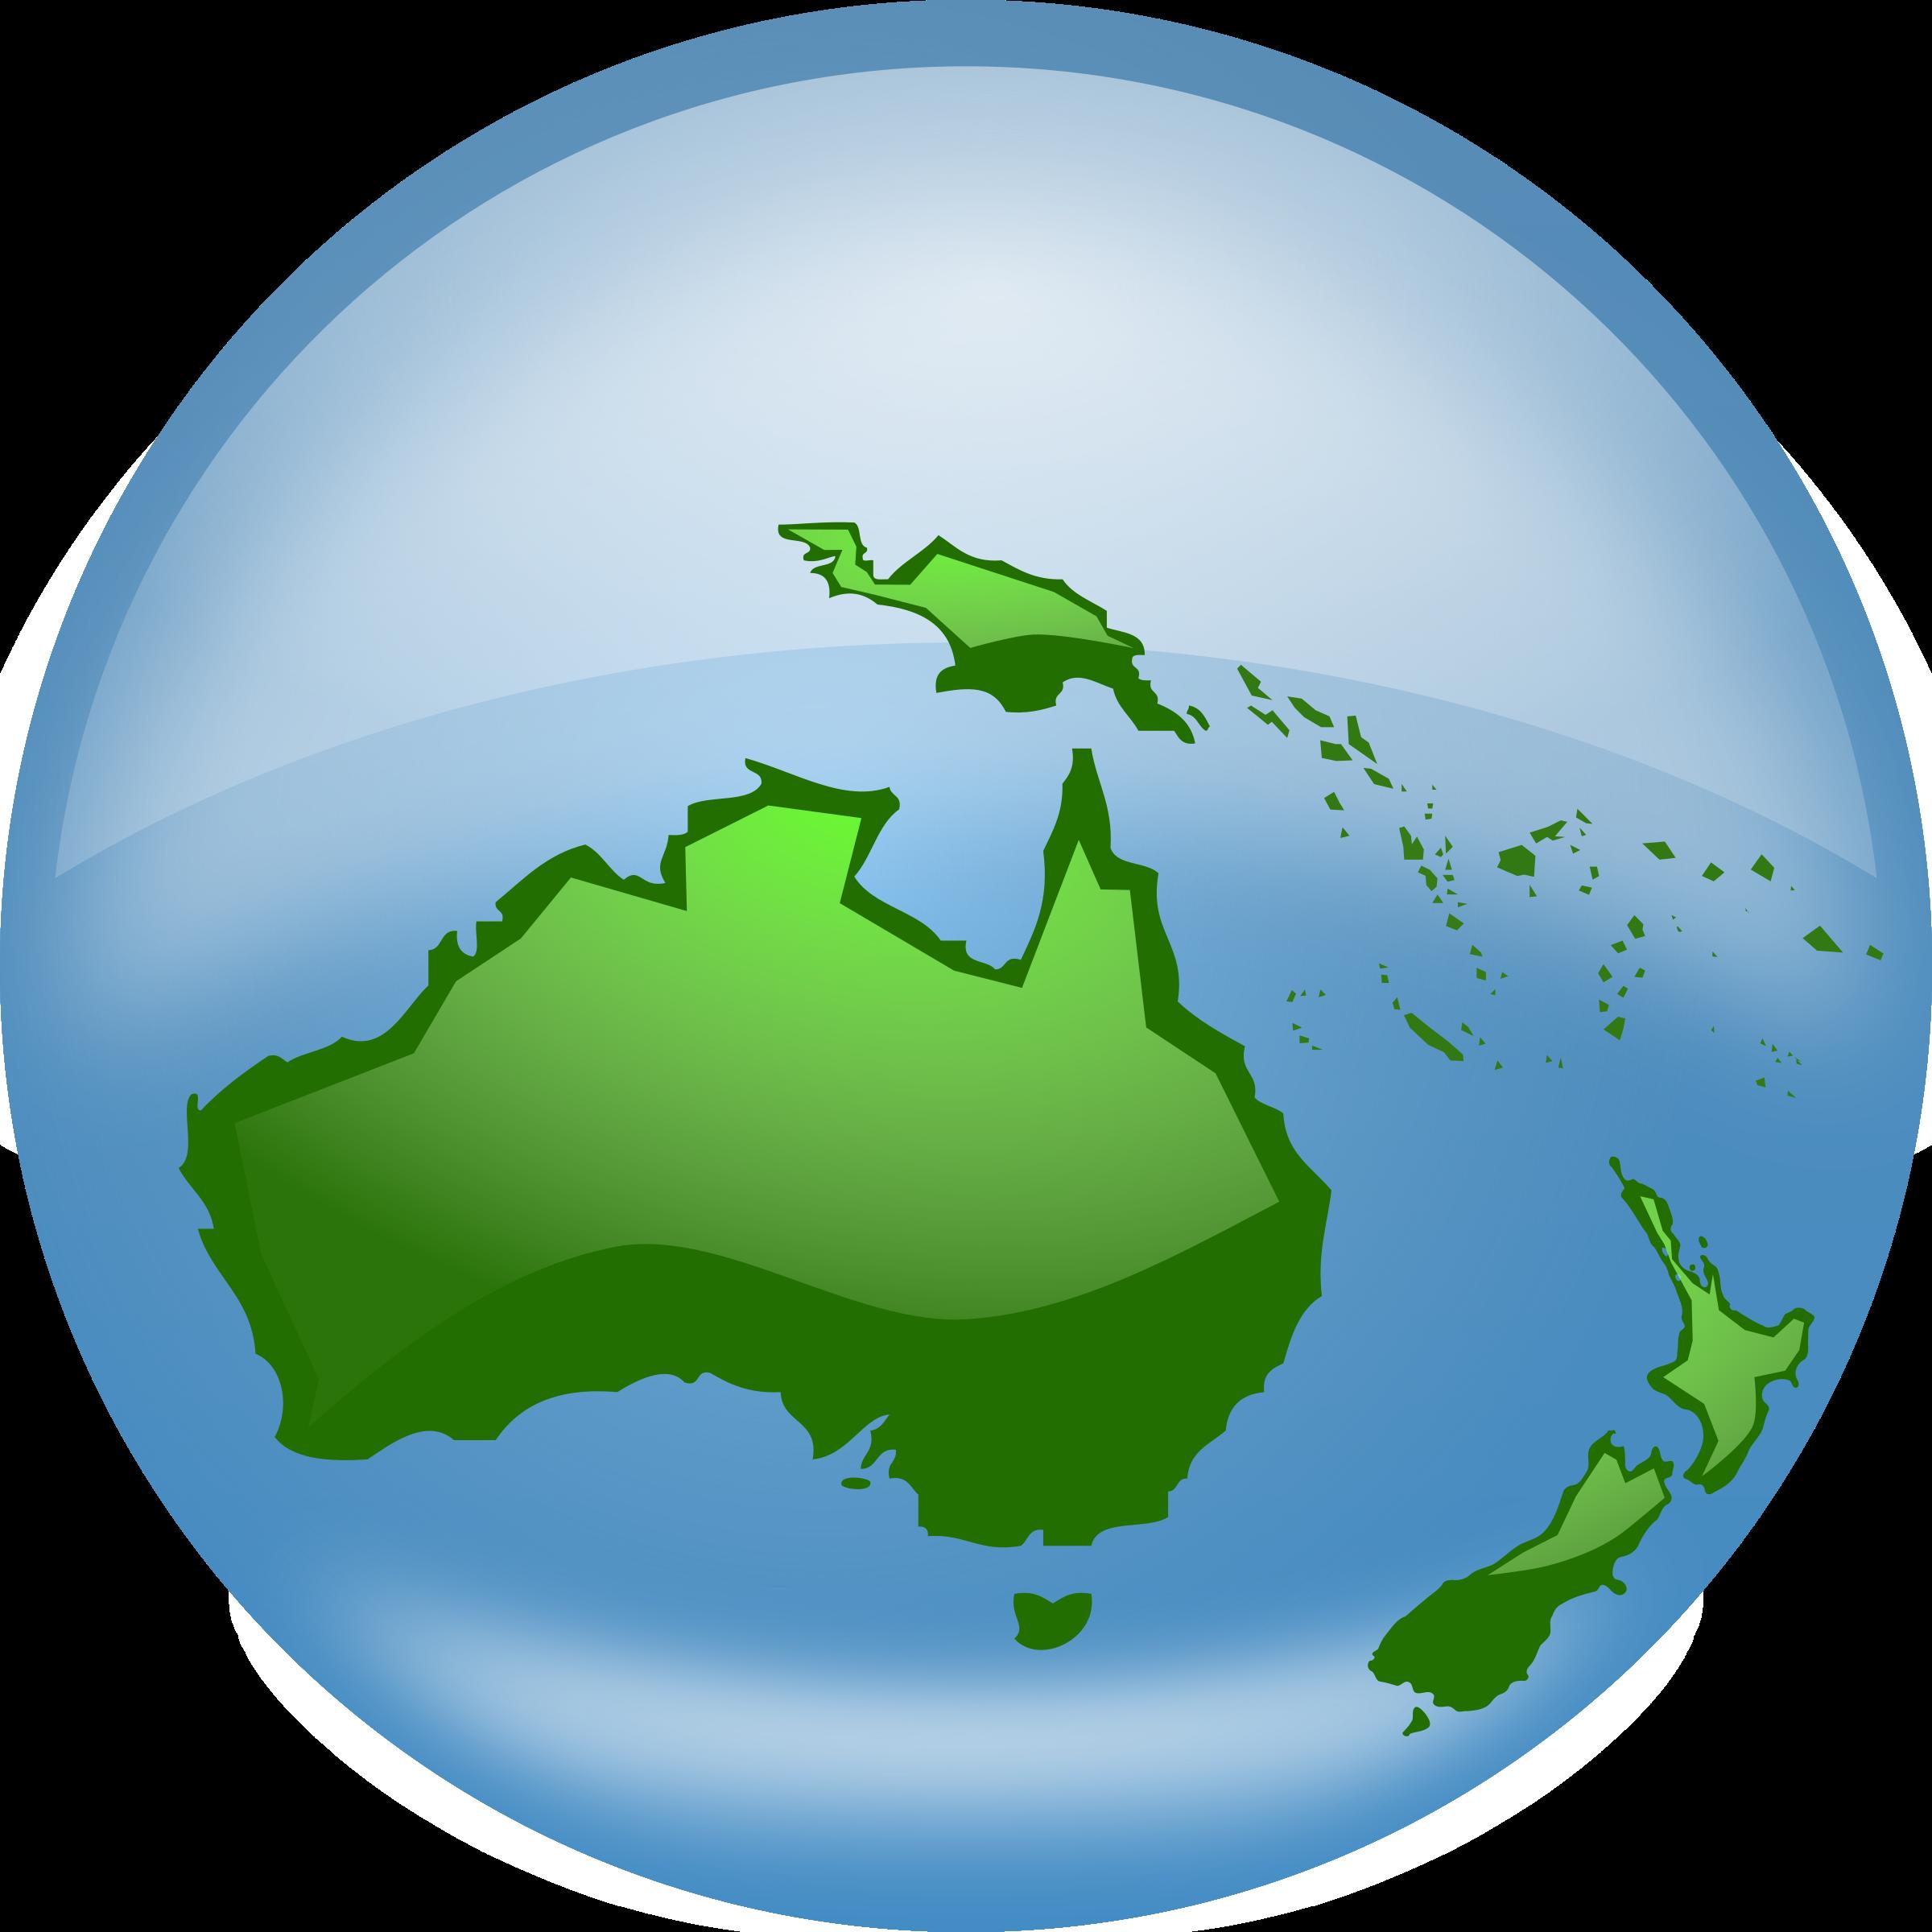 World globe map clipart graphic transparent Clipart - Oceania Globe graphic transparent